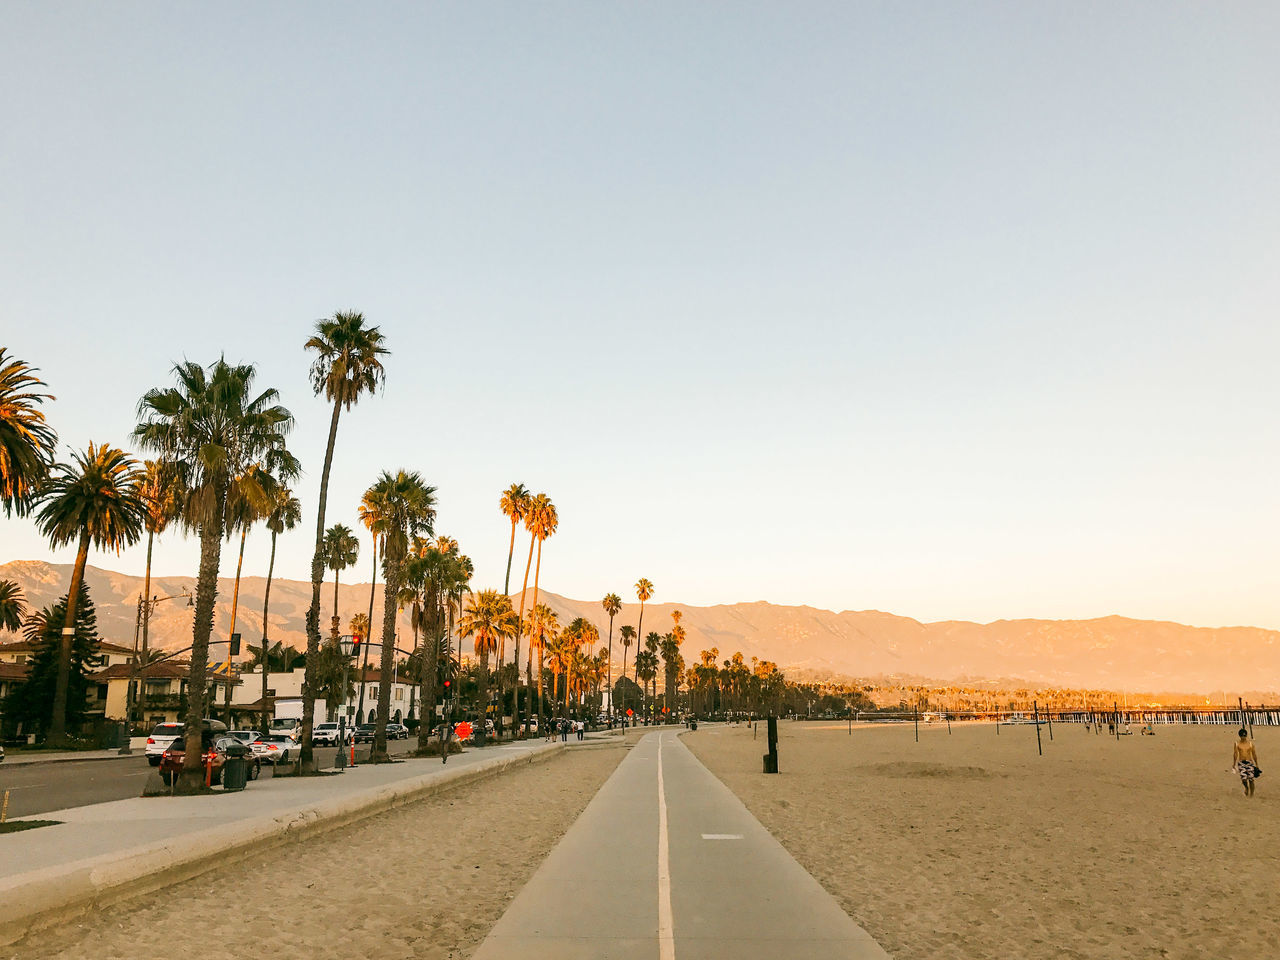 Adult Adults Only Day Nature Outdoors Palm Tree People Santa Barbara Santa Barbara, CA Travel Destinations Tree